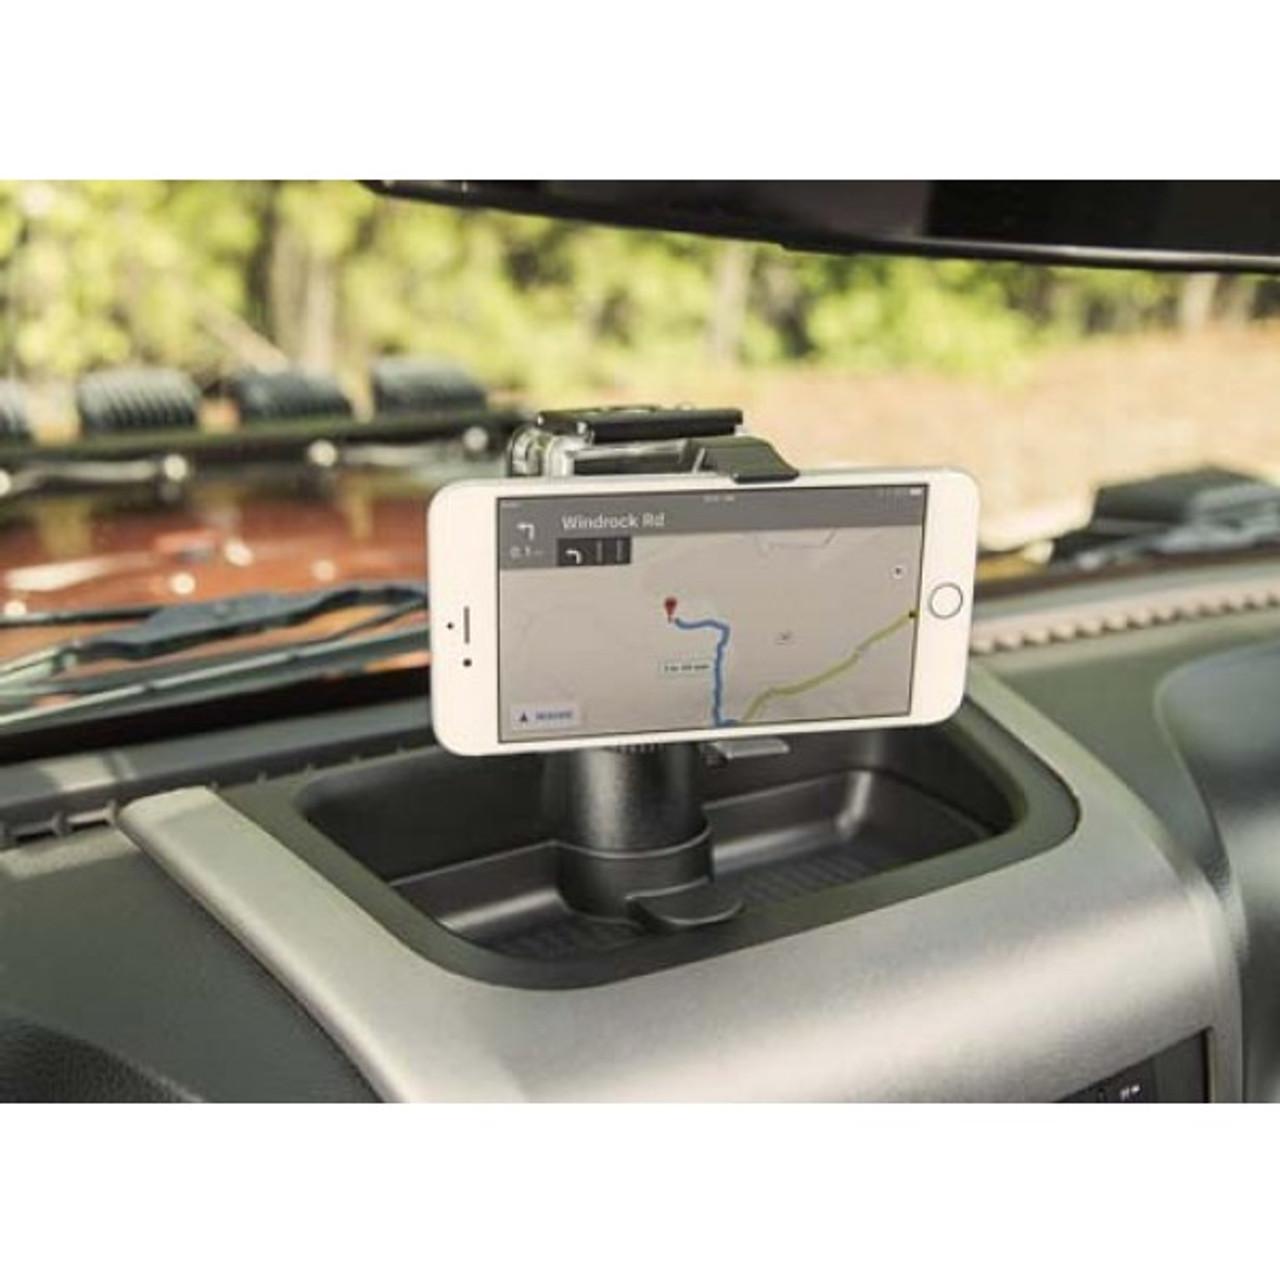 Rugged Ridge Dash Multi-Mount Phone Kit for Wrangler JK 2011+